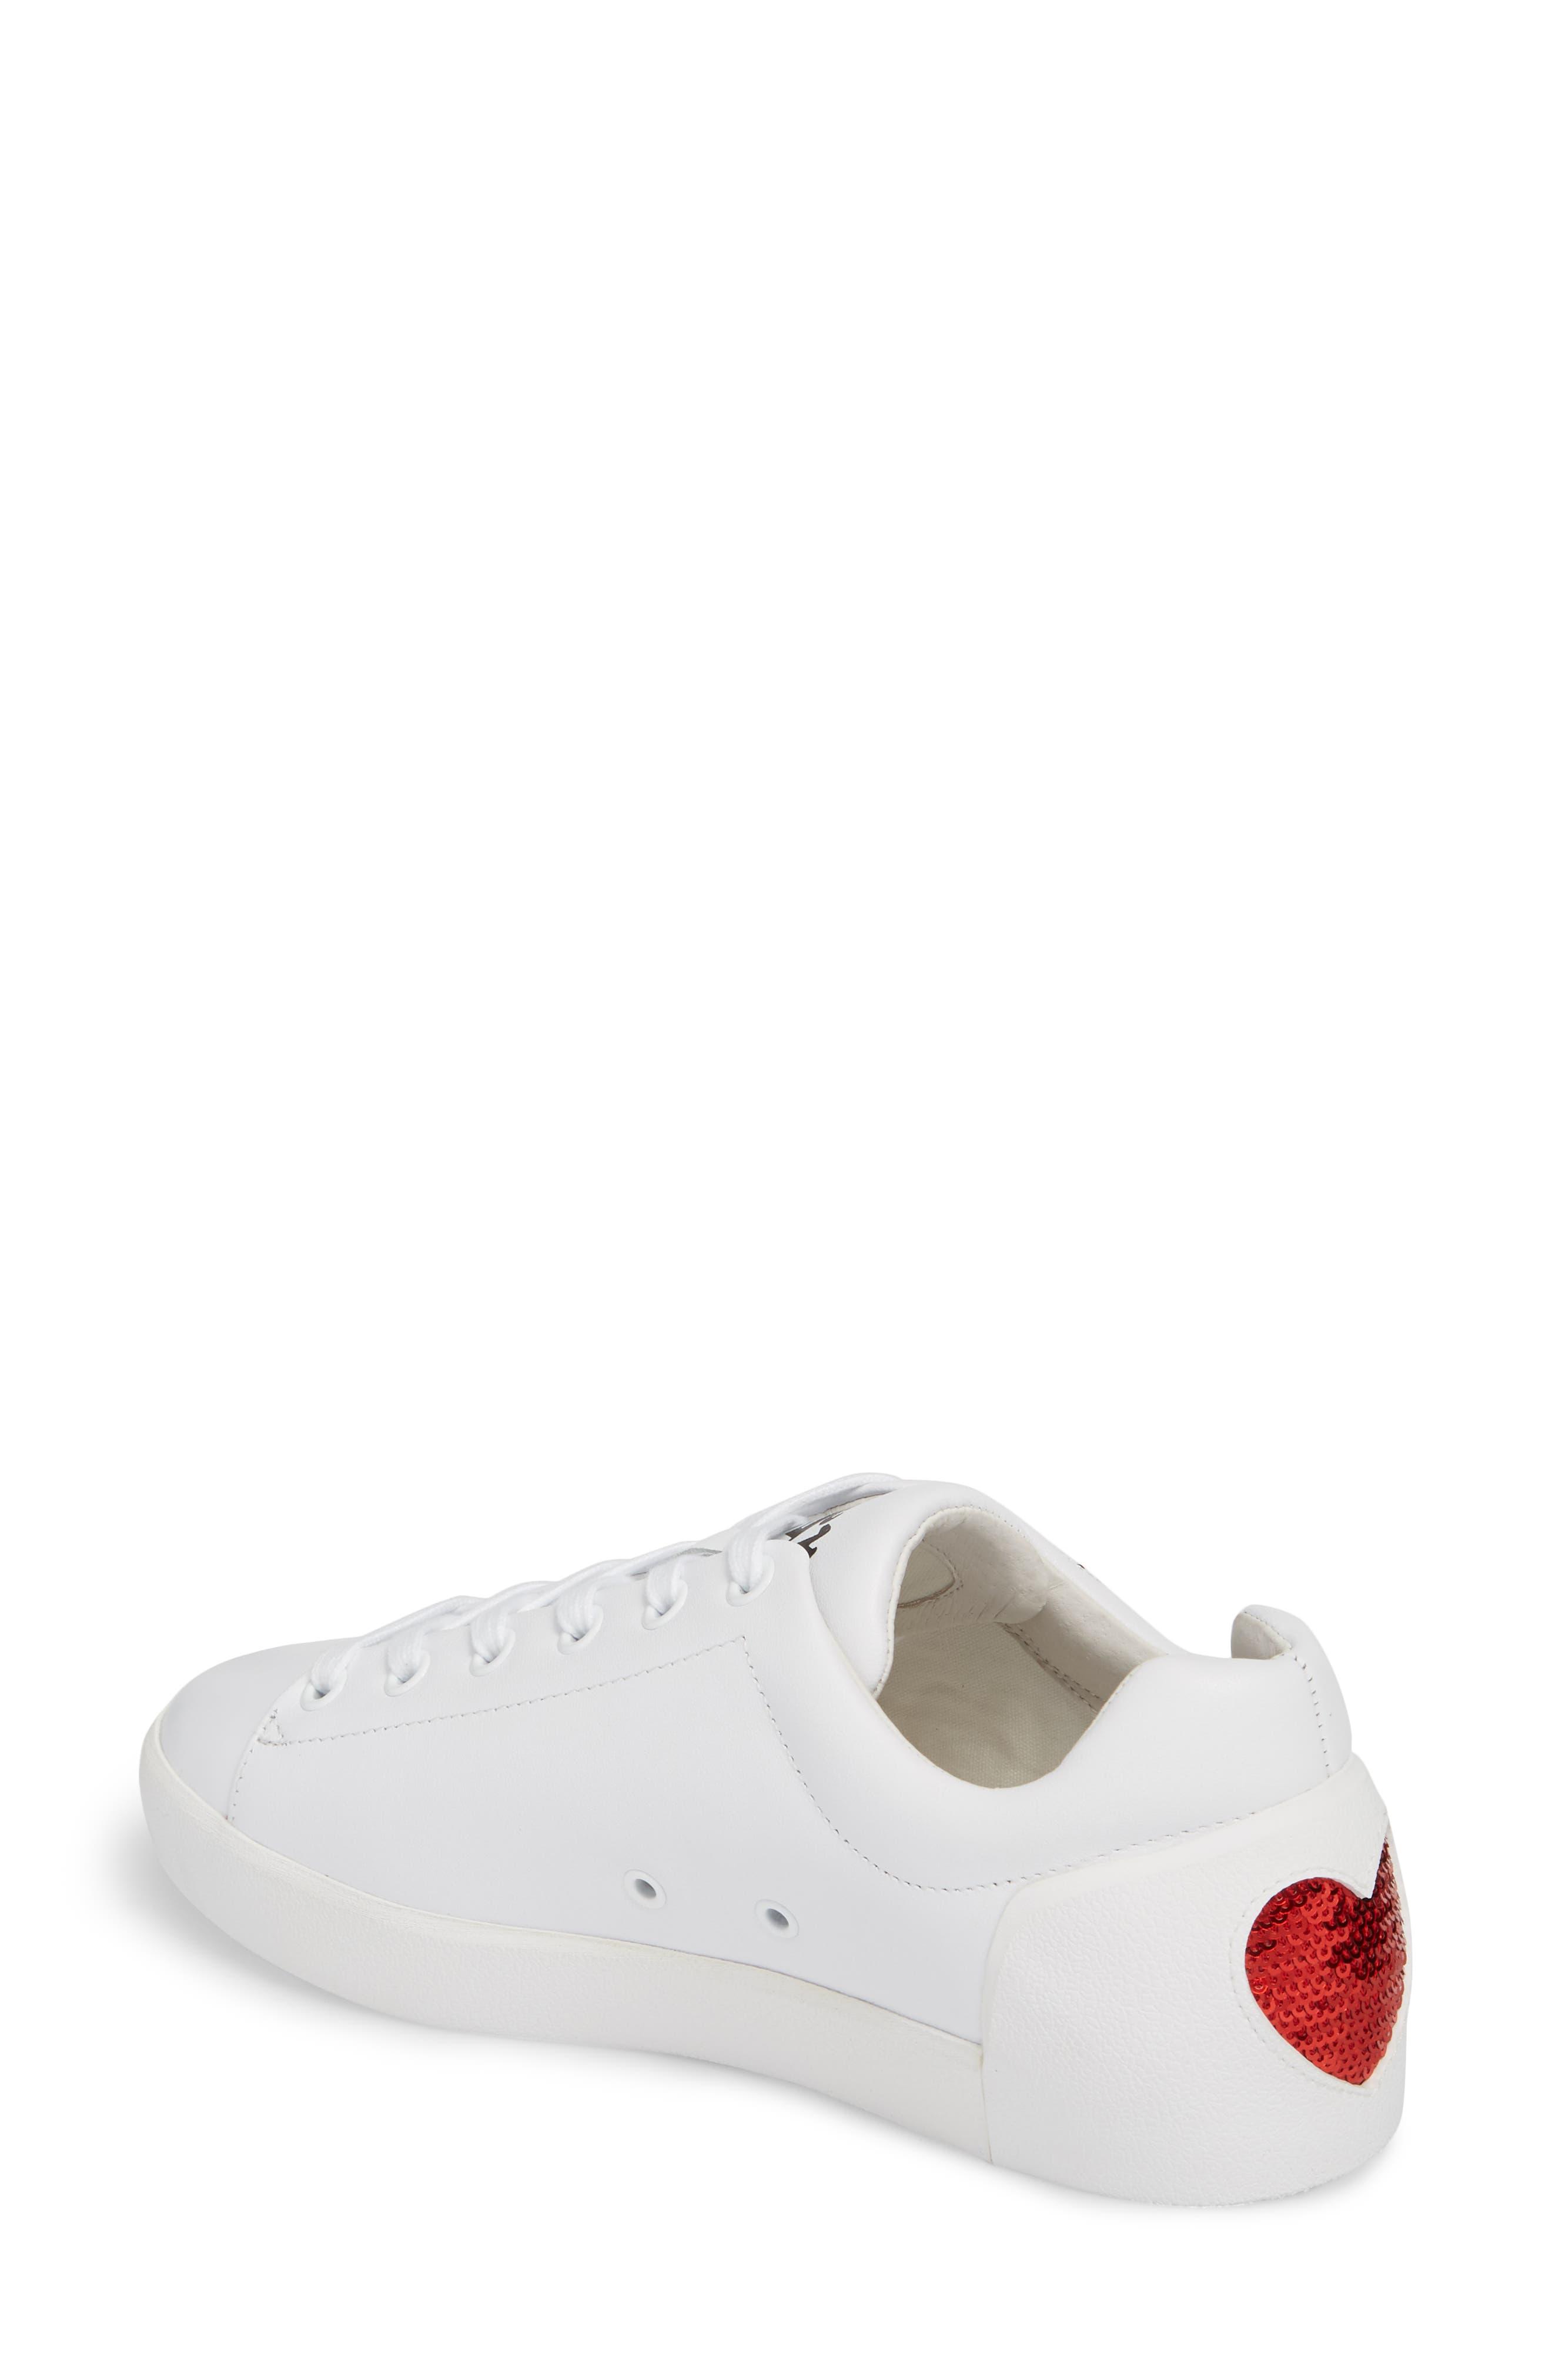 Nikita Sneaker,                             Alternate thumbnail 2, color,                             White/ Red